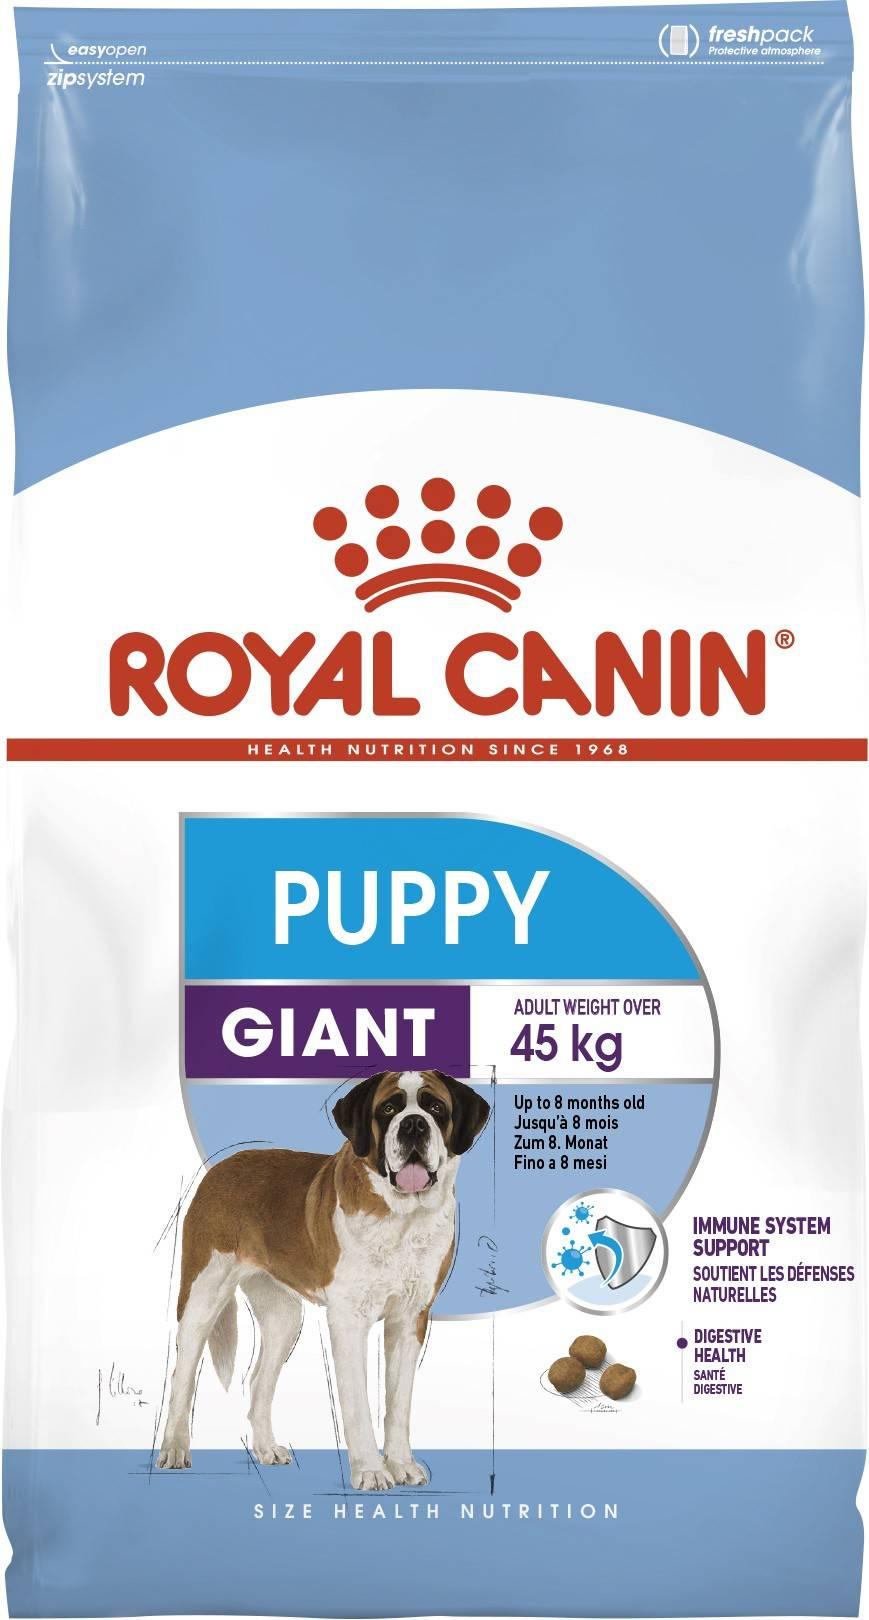 ROYAL CANIN GIANT PUPPY – сухой корм для щенков гигантских пород